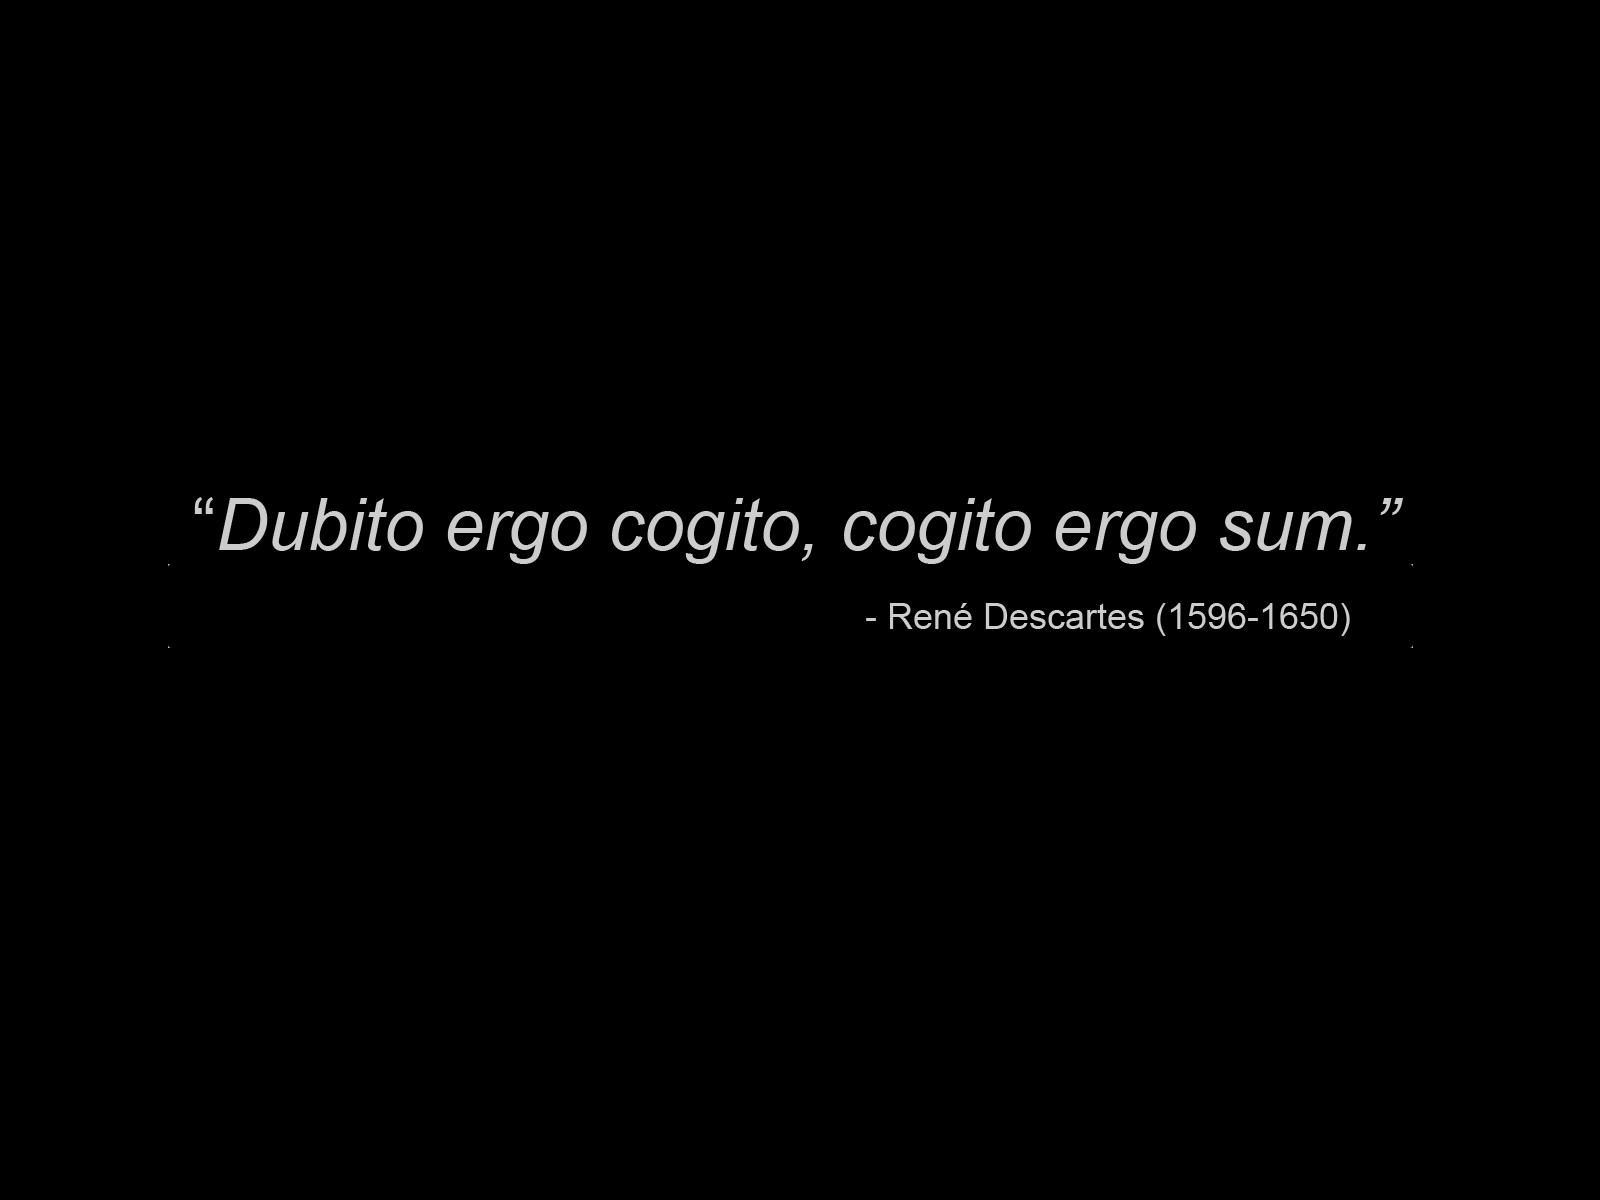 Latin quote #2